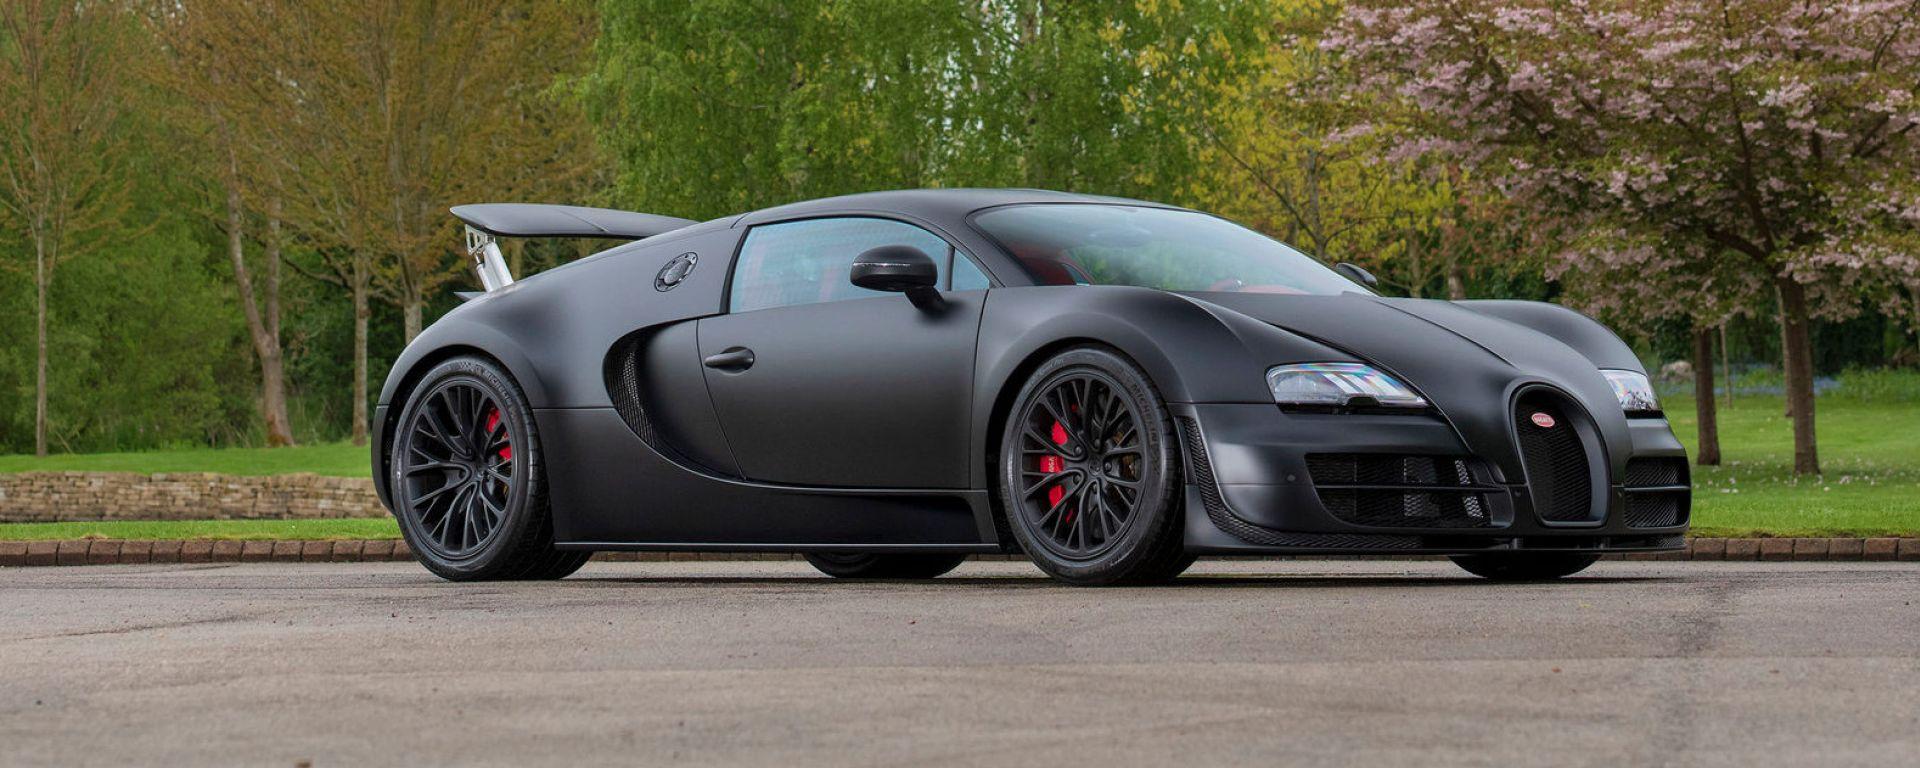 All'asta l'ultima Bugatti Veyron Super Sport